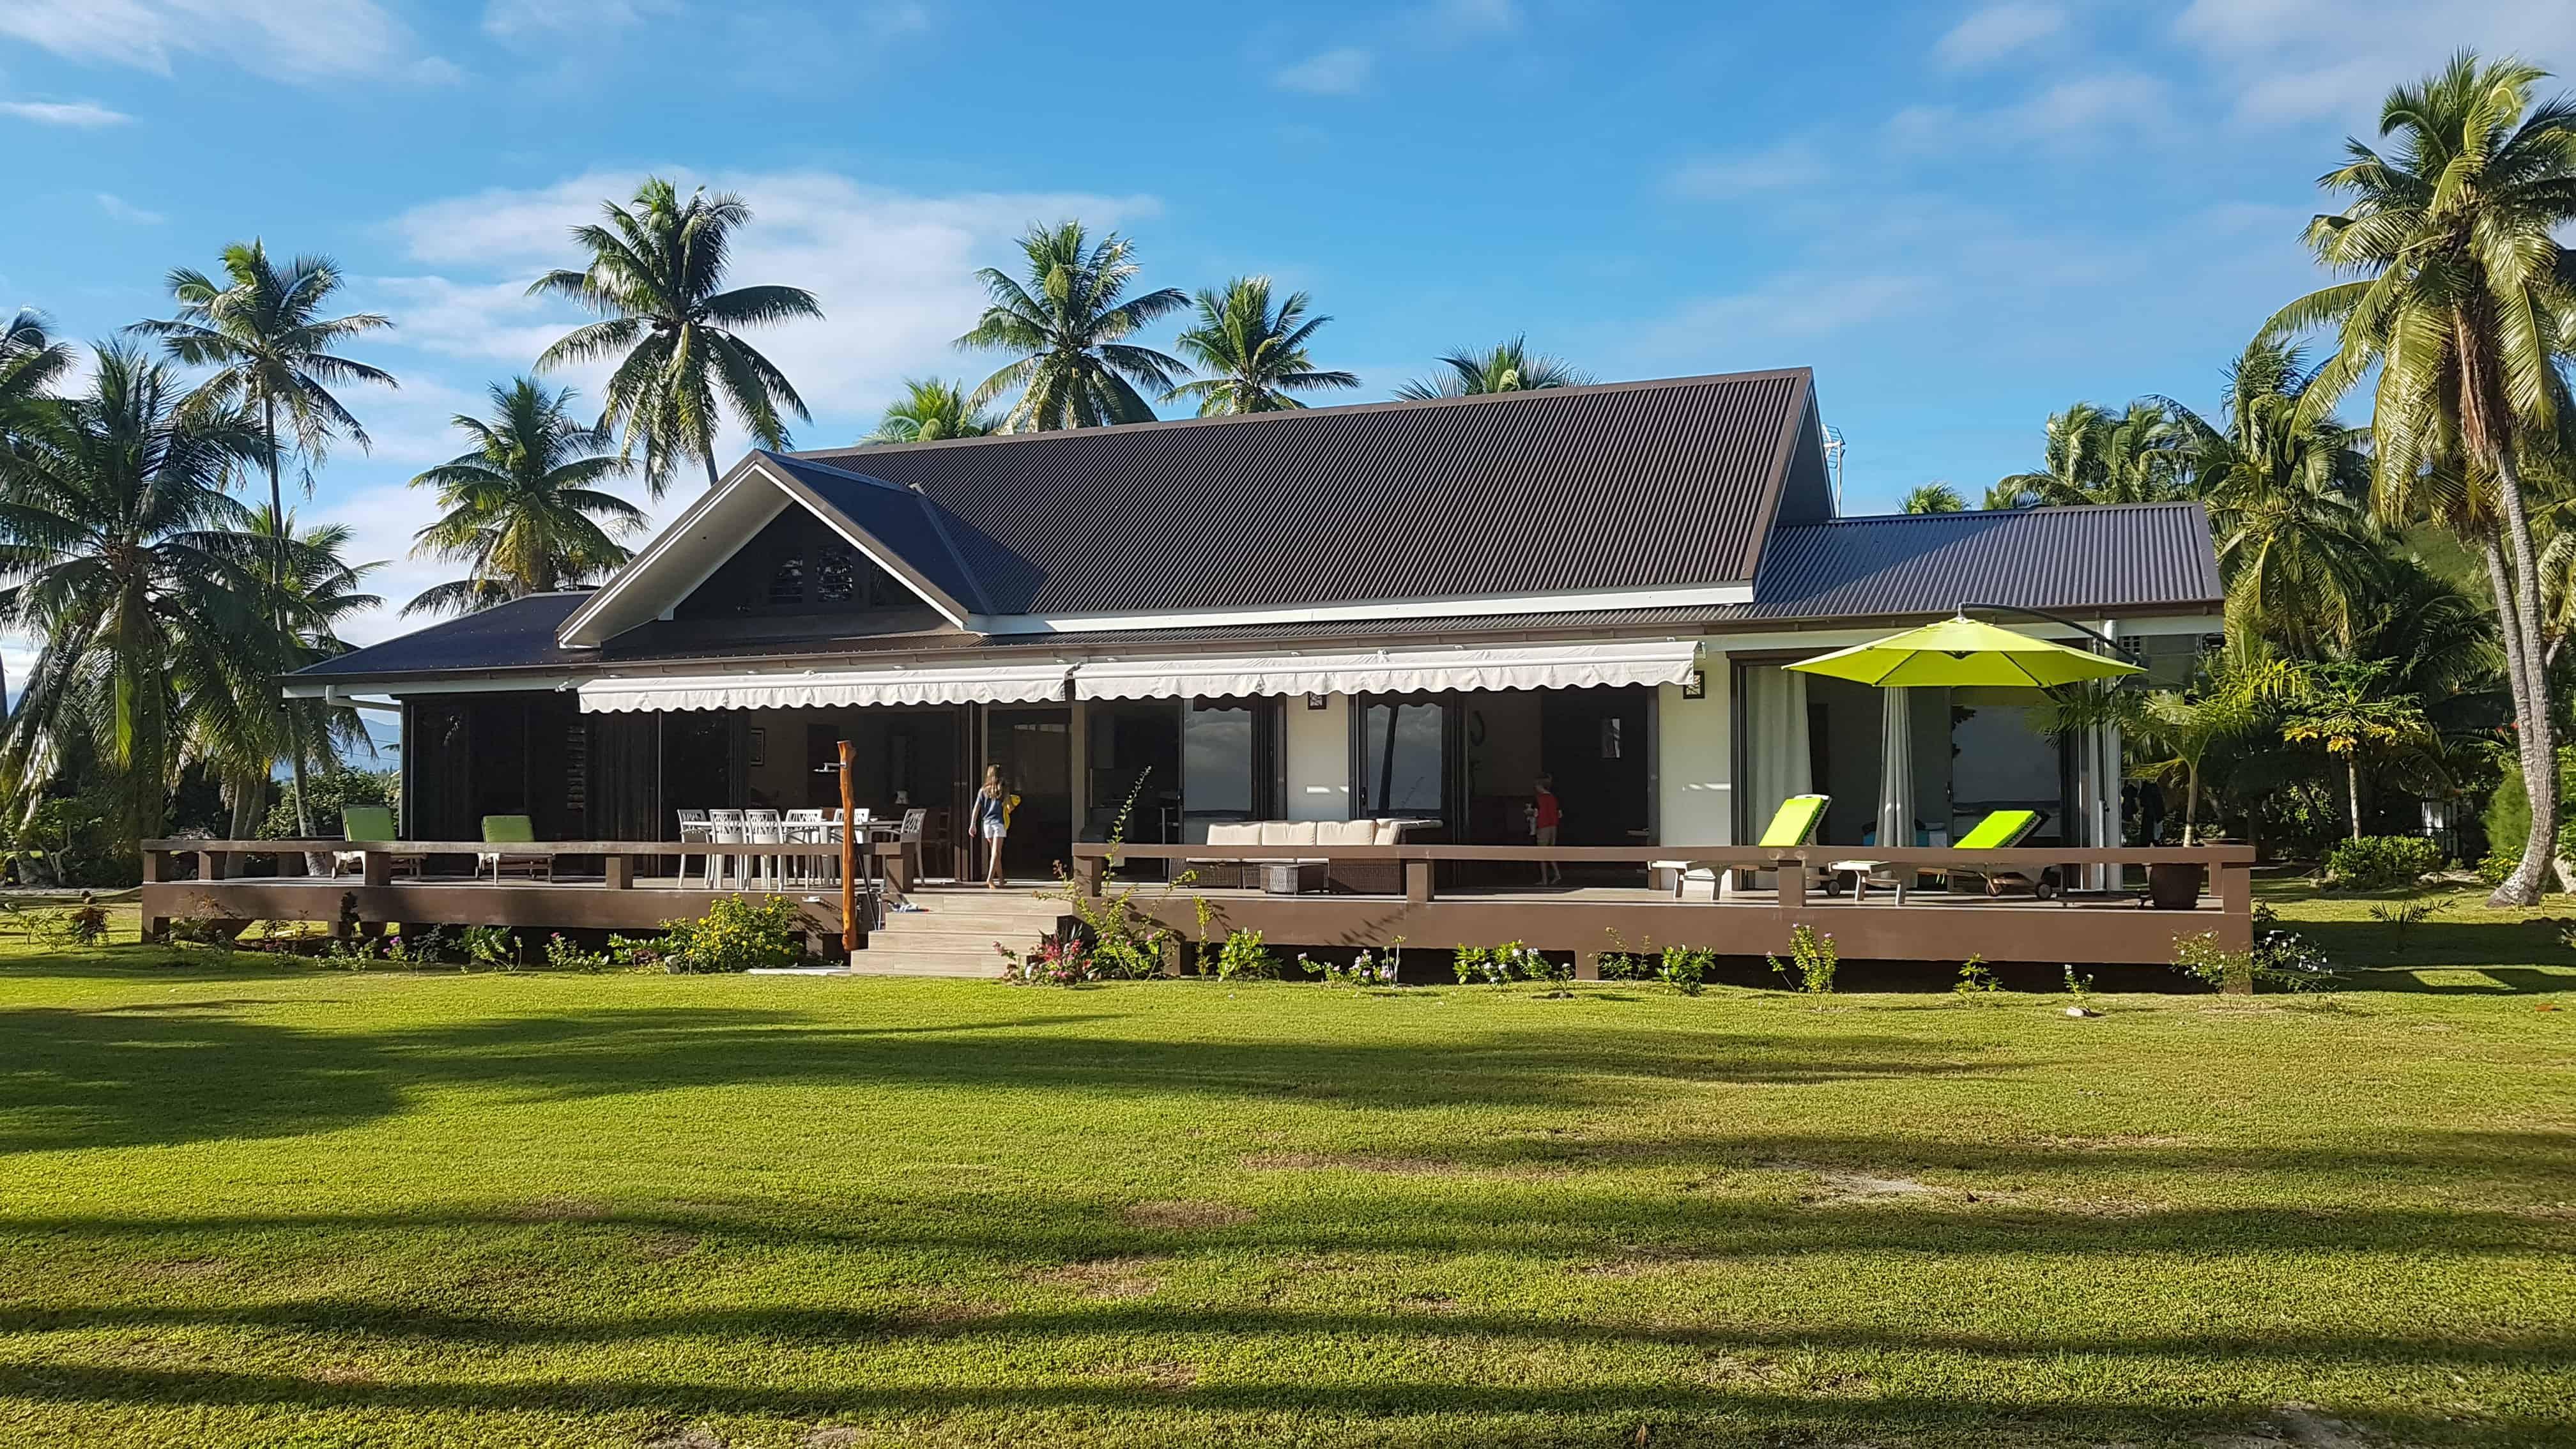 https://tahititourisme.fr/wp-content/uploads/2018/09/Villa-Tiarenui-by-Tahiti-Homes-®-a-Moorea-4.jpg